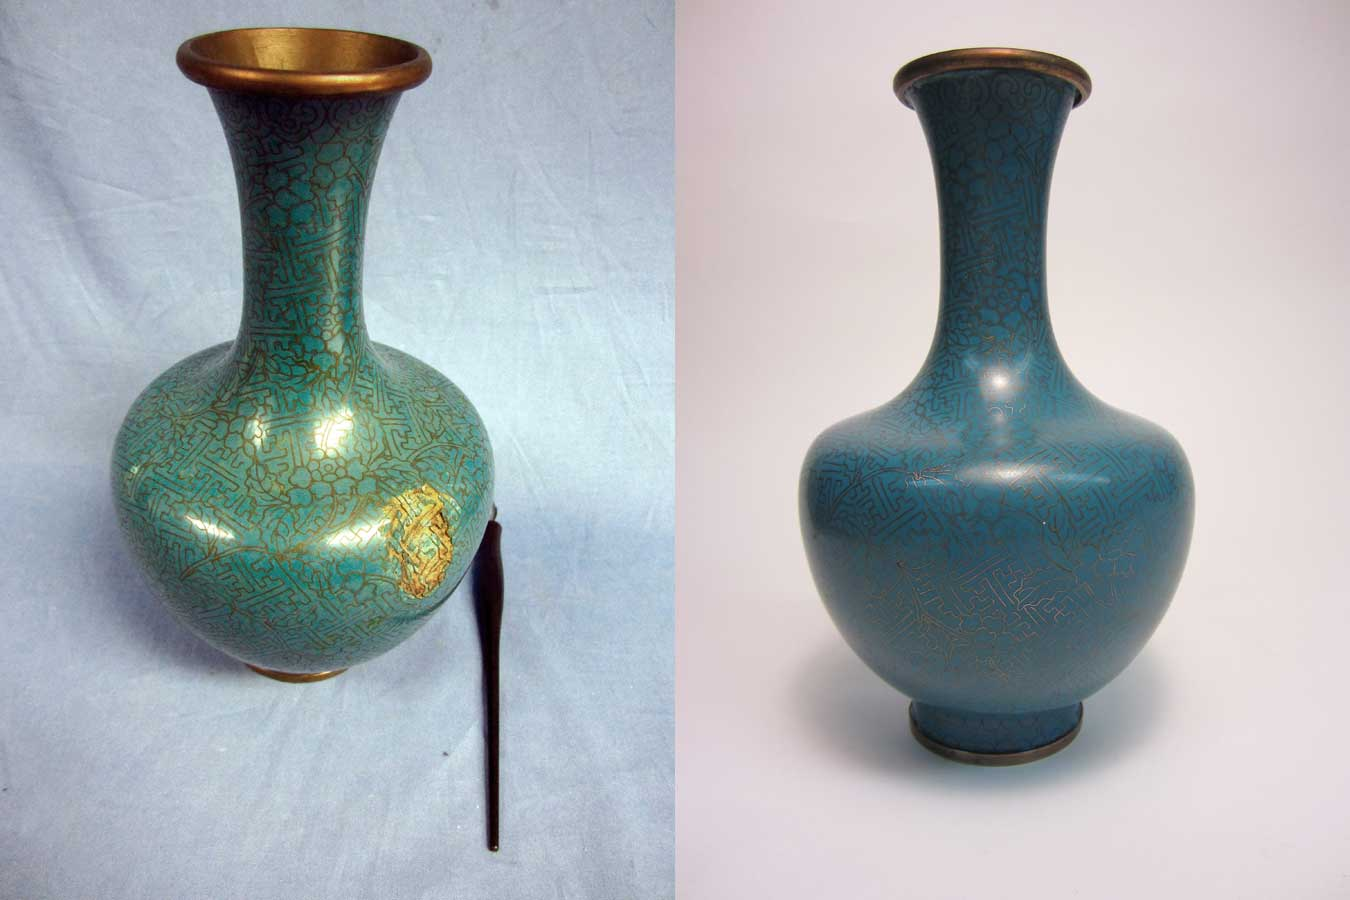 Japanese Antique Cloisonne Vase Restoration Services